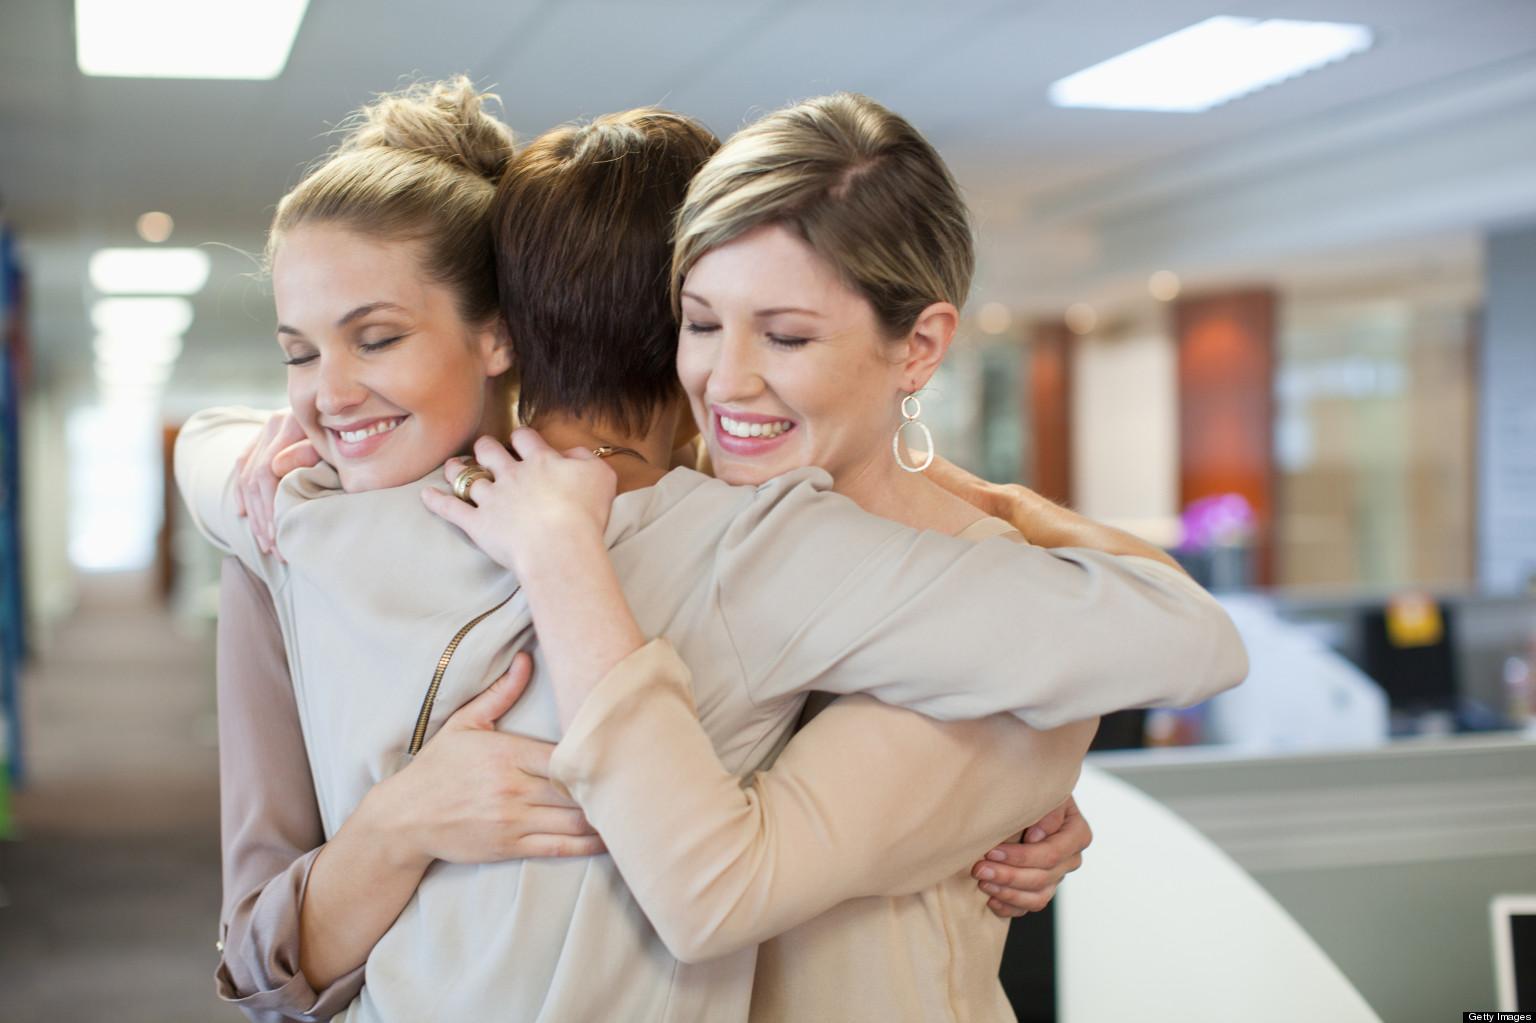 o WOMEN HUGGING facebook - Lakukan 15 Kebiasaan Kecil Ini Untuk Menjadi Wanita yang Semakin Baik dan Teratur